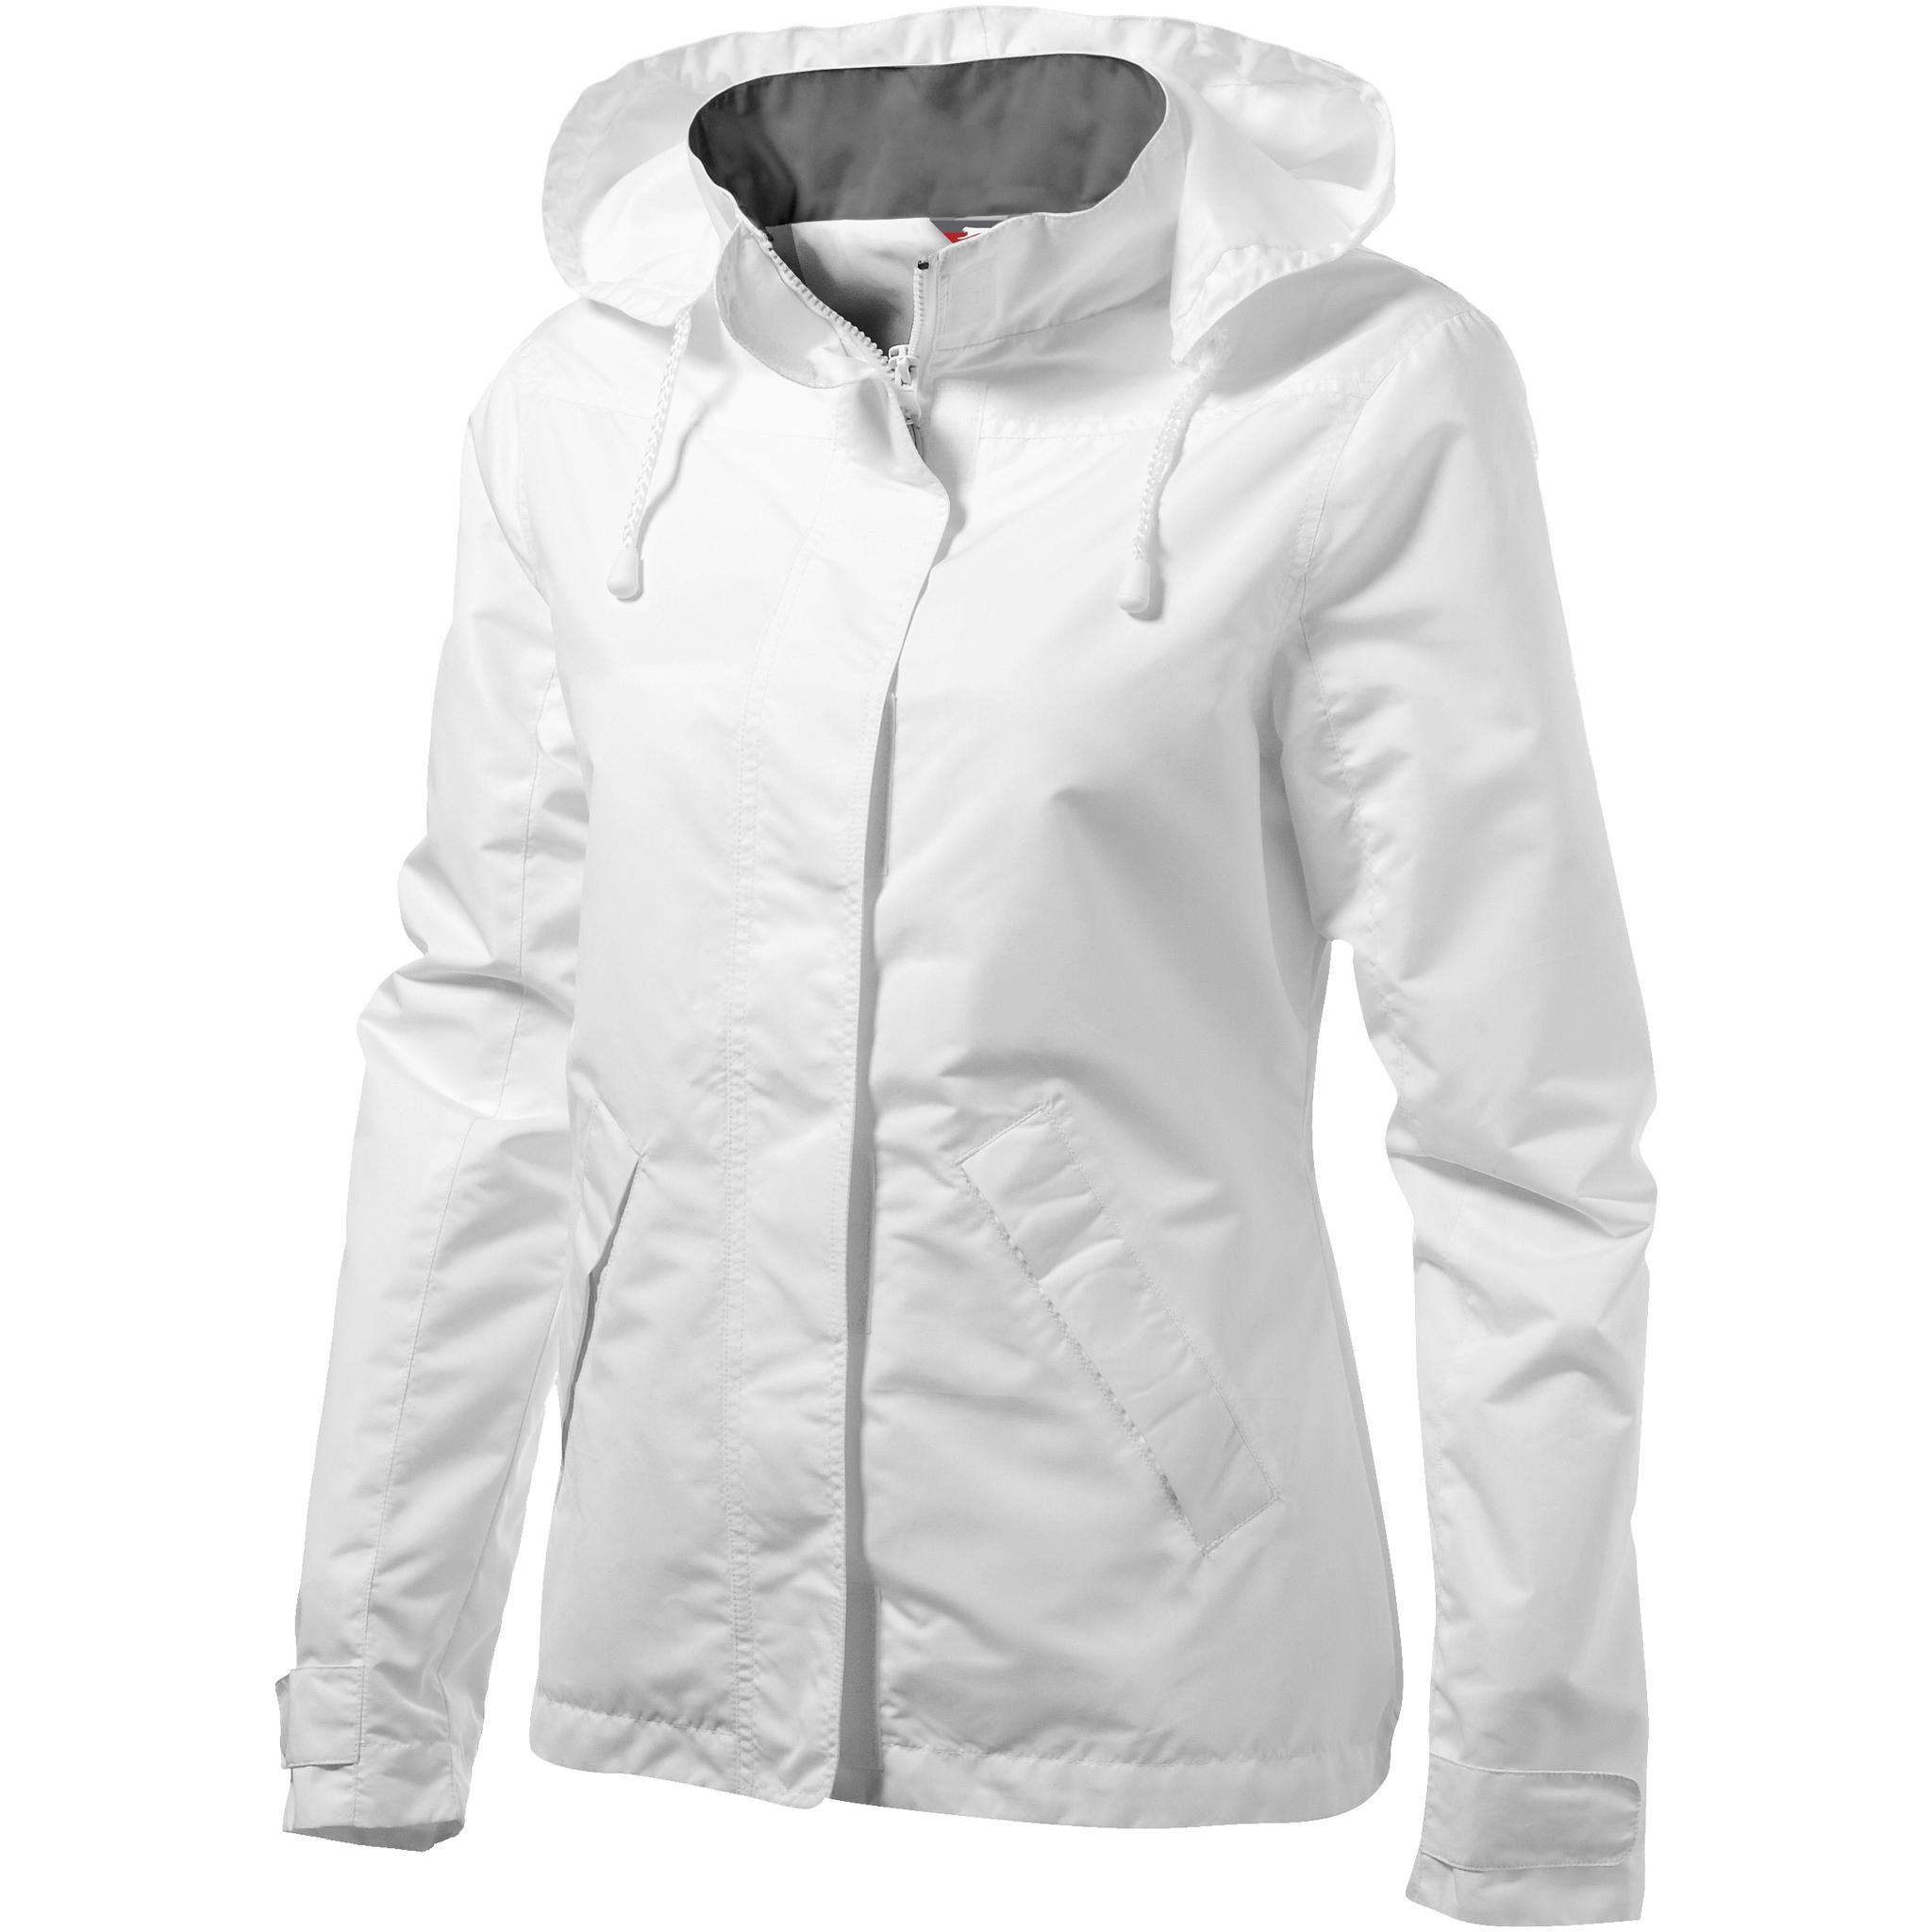 Slazenger Womens/Ladies Top Spin Jacket (XL) (Sky Blue)